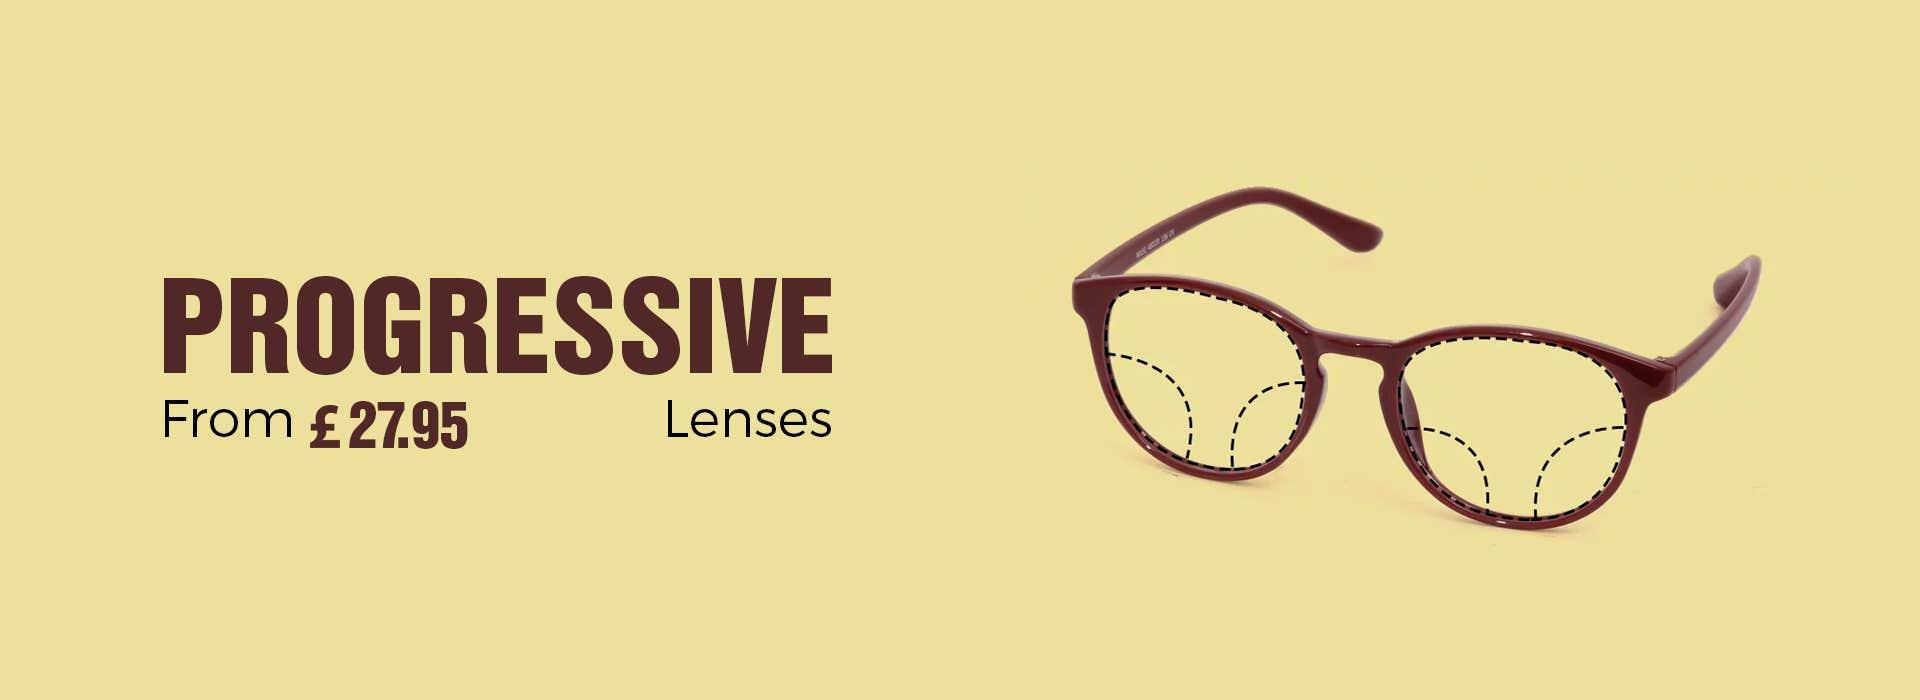 64725d20b340 Buy Progressive Eyeglasses Online | Goggles4u.co.uk